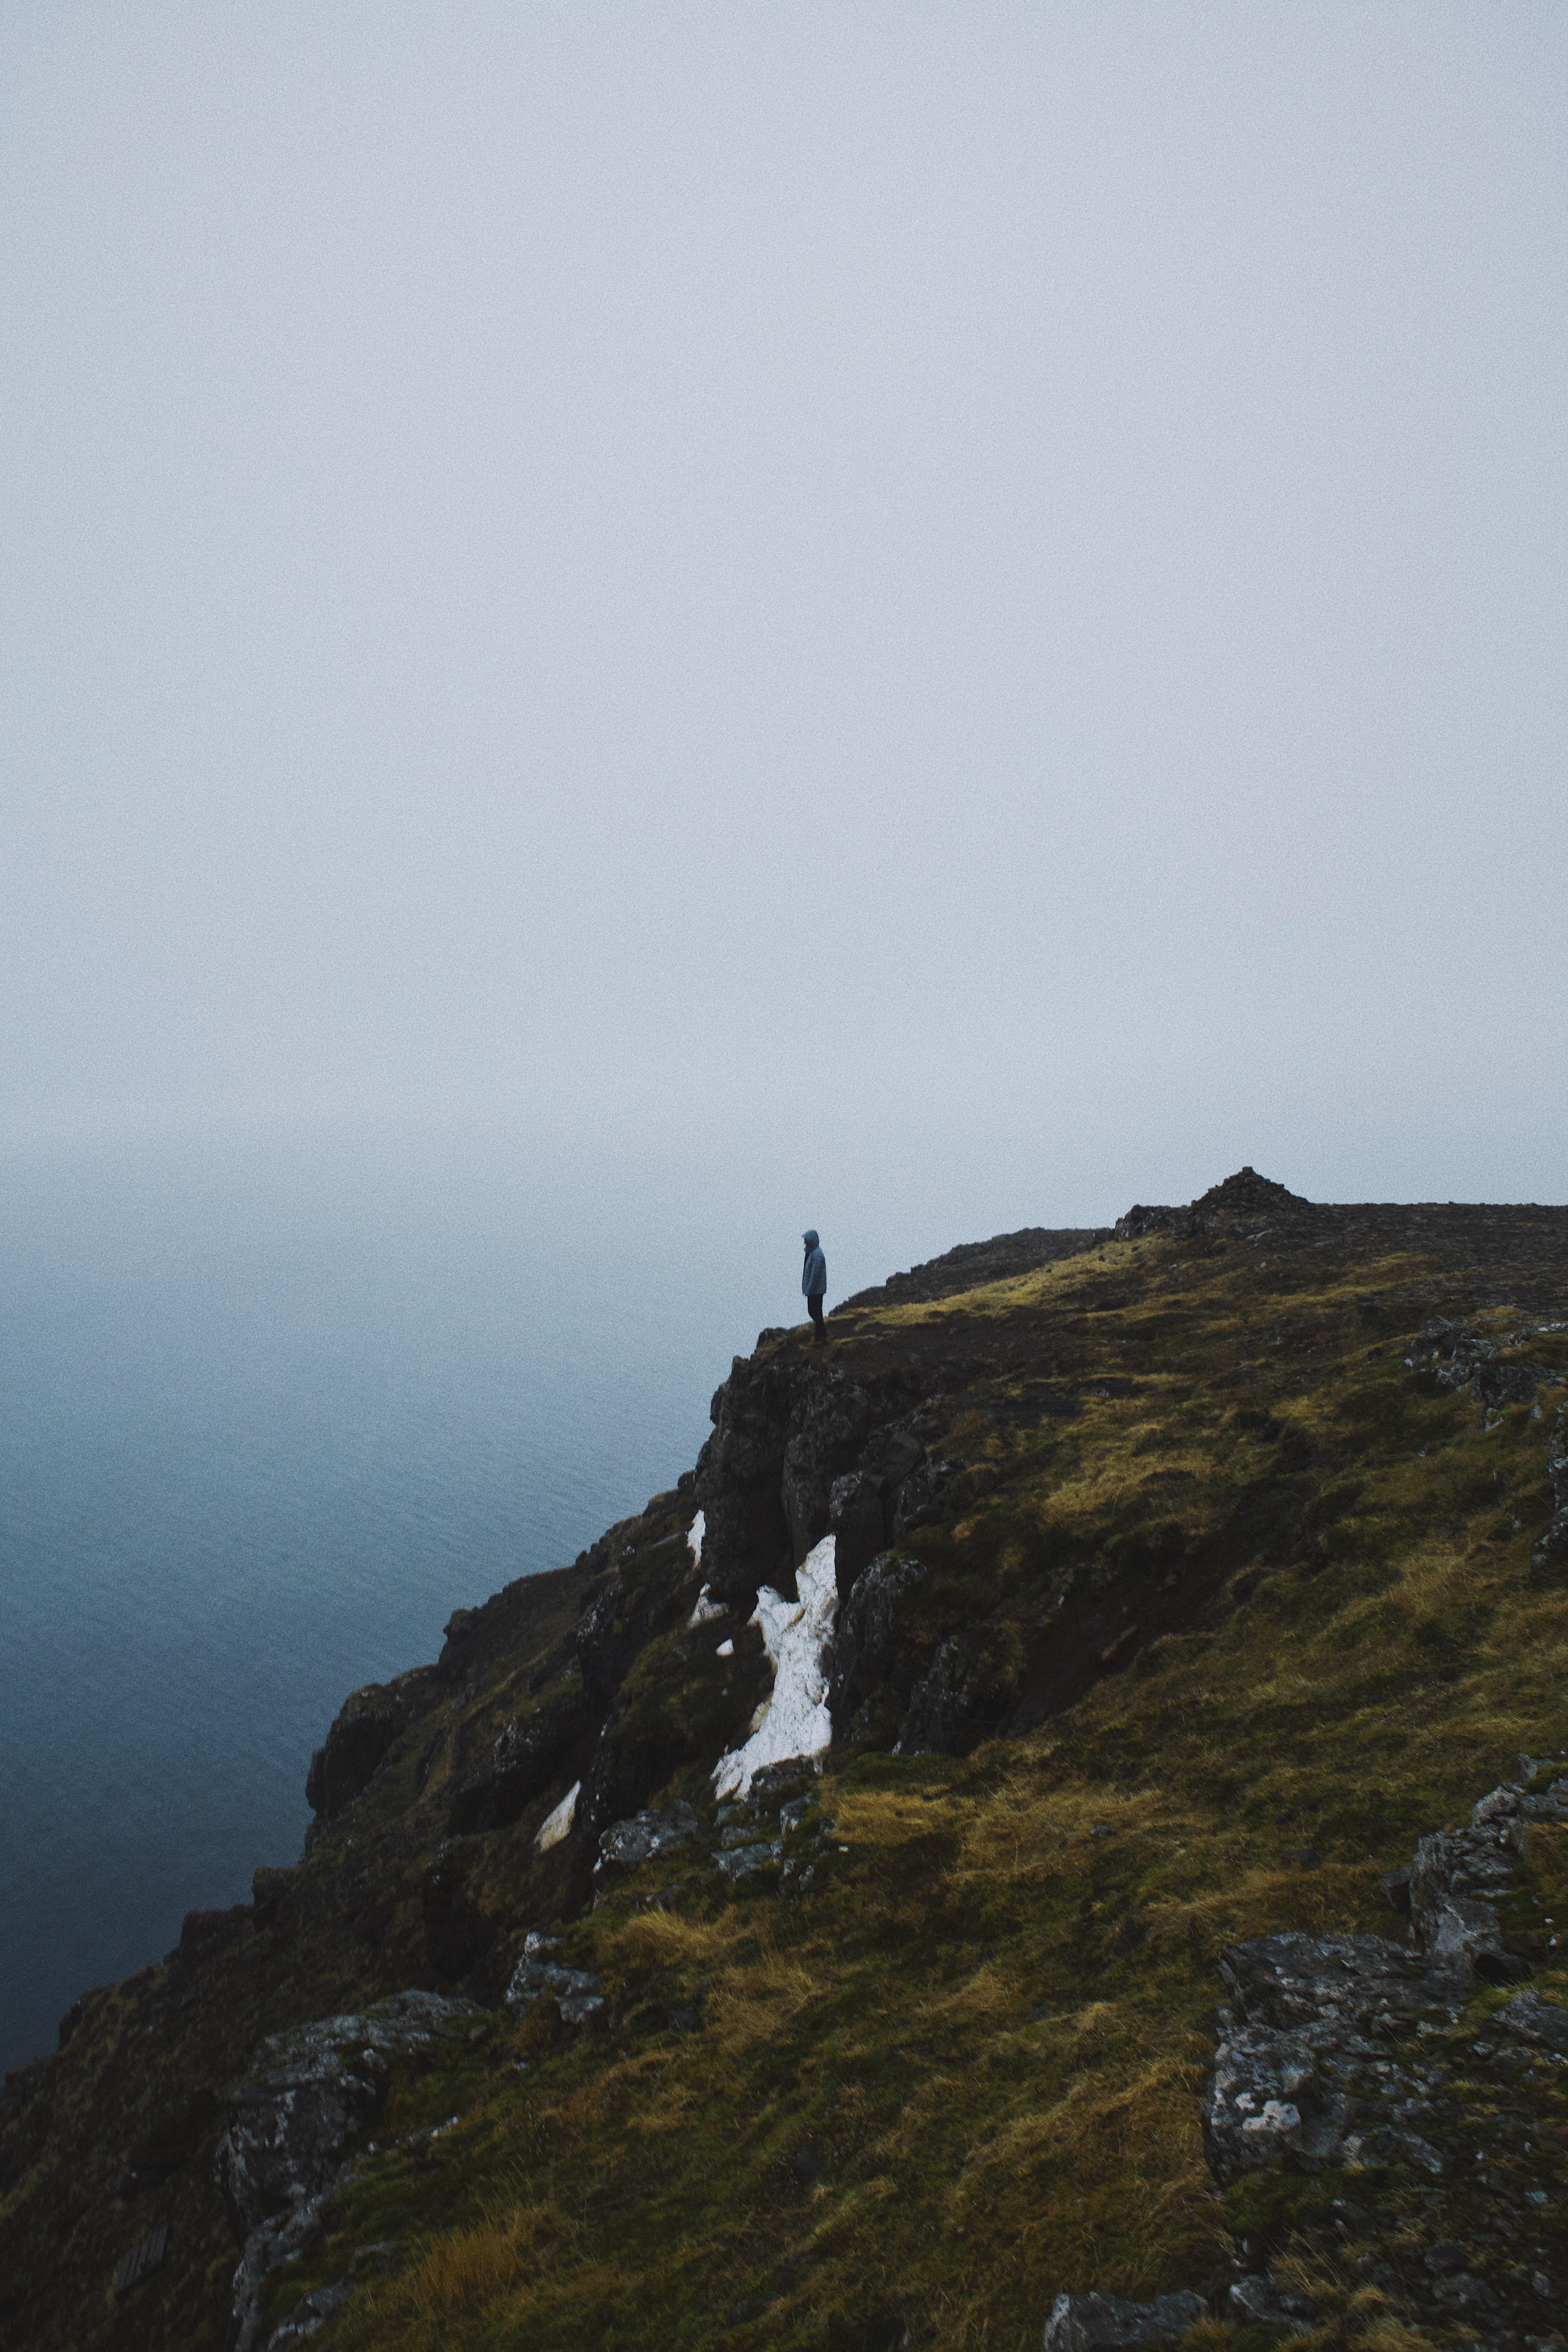 Ghania-iratni-photographe-bordeaux-voyage-islande-